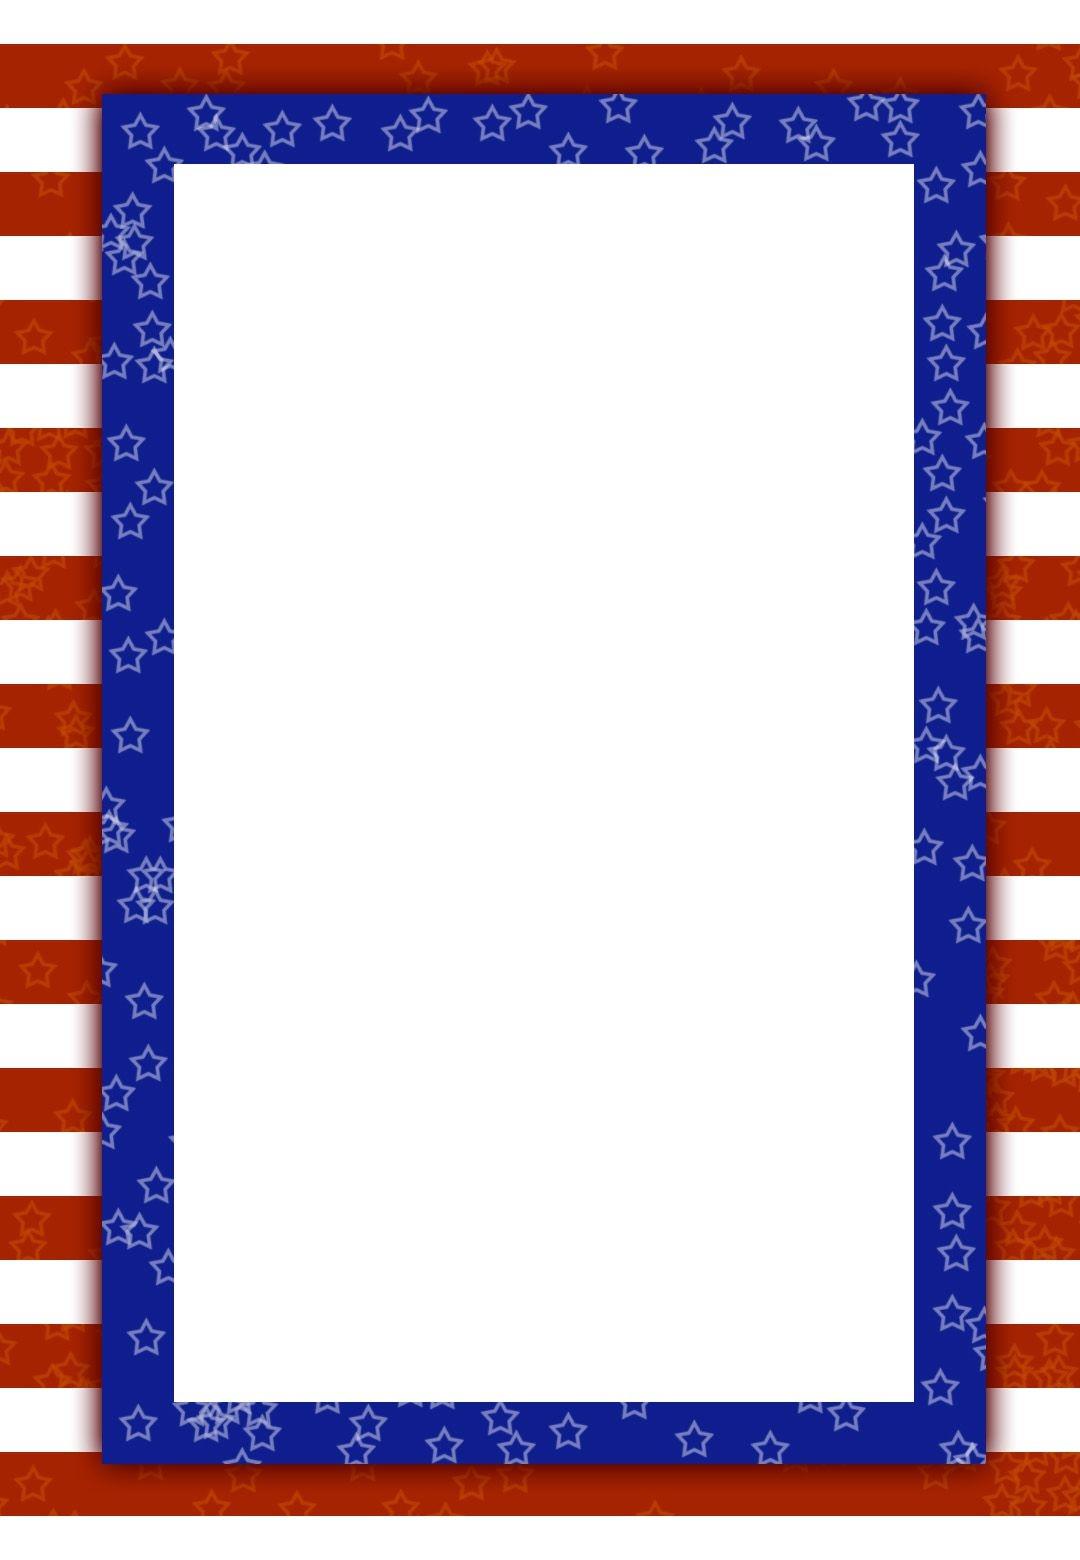 Free Printable Patriotic Invitation | 4Th Of July | 4Th Of July - Free Printable 4Th Of July Stationery